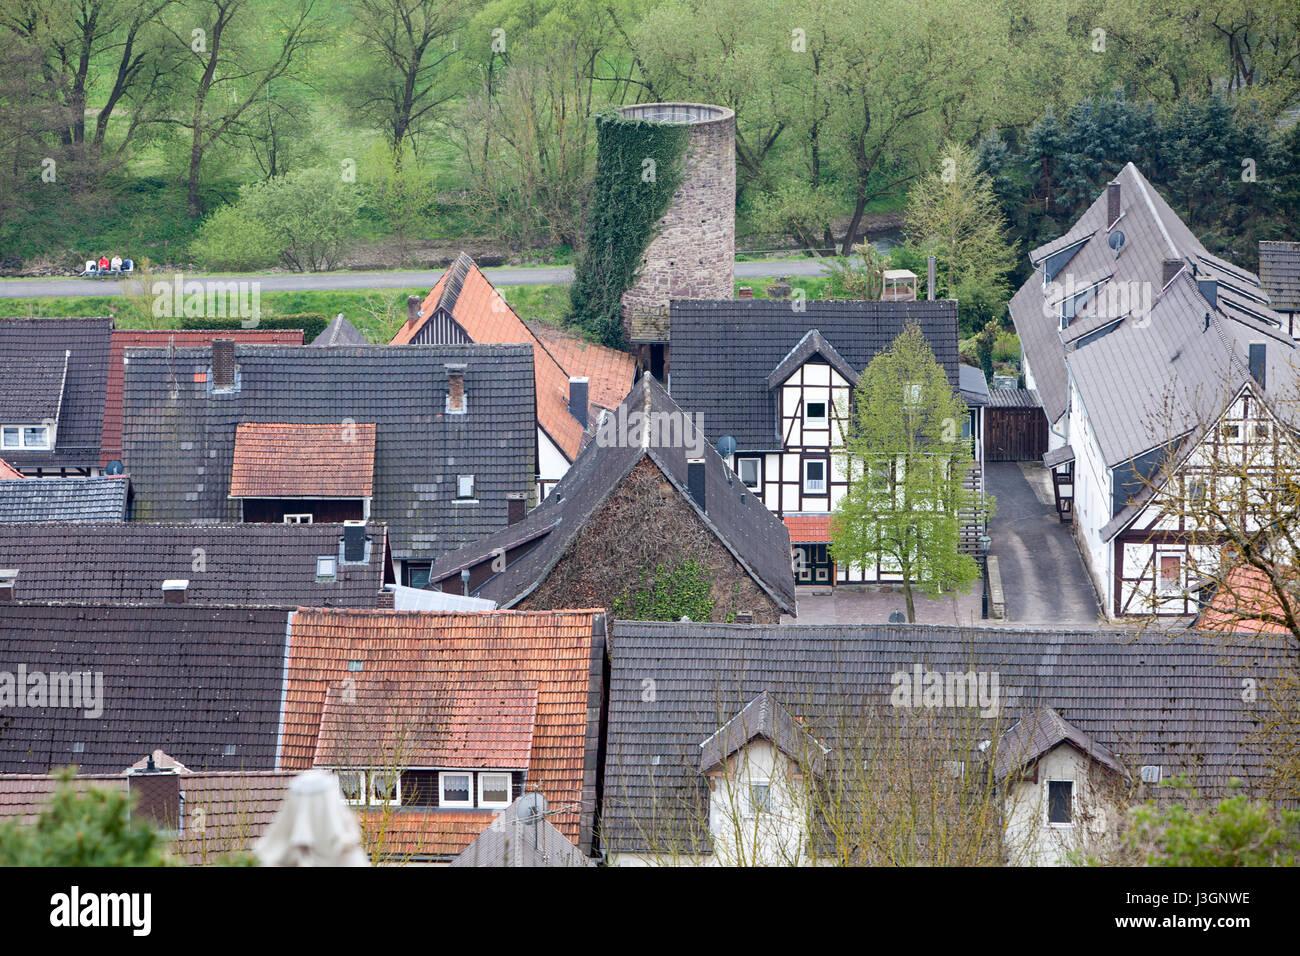 Helmarshausen, Bad Karlshafen, Upper Weser Valley,  Weser Uplands, Weserbergland, Reinhardswald, Hesse, Germany - Stock Image